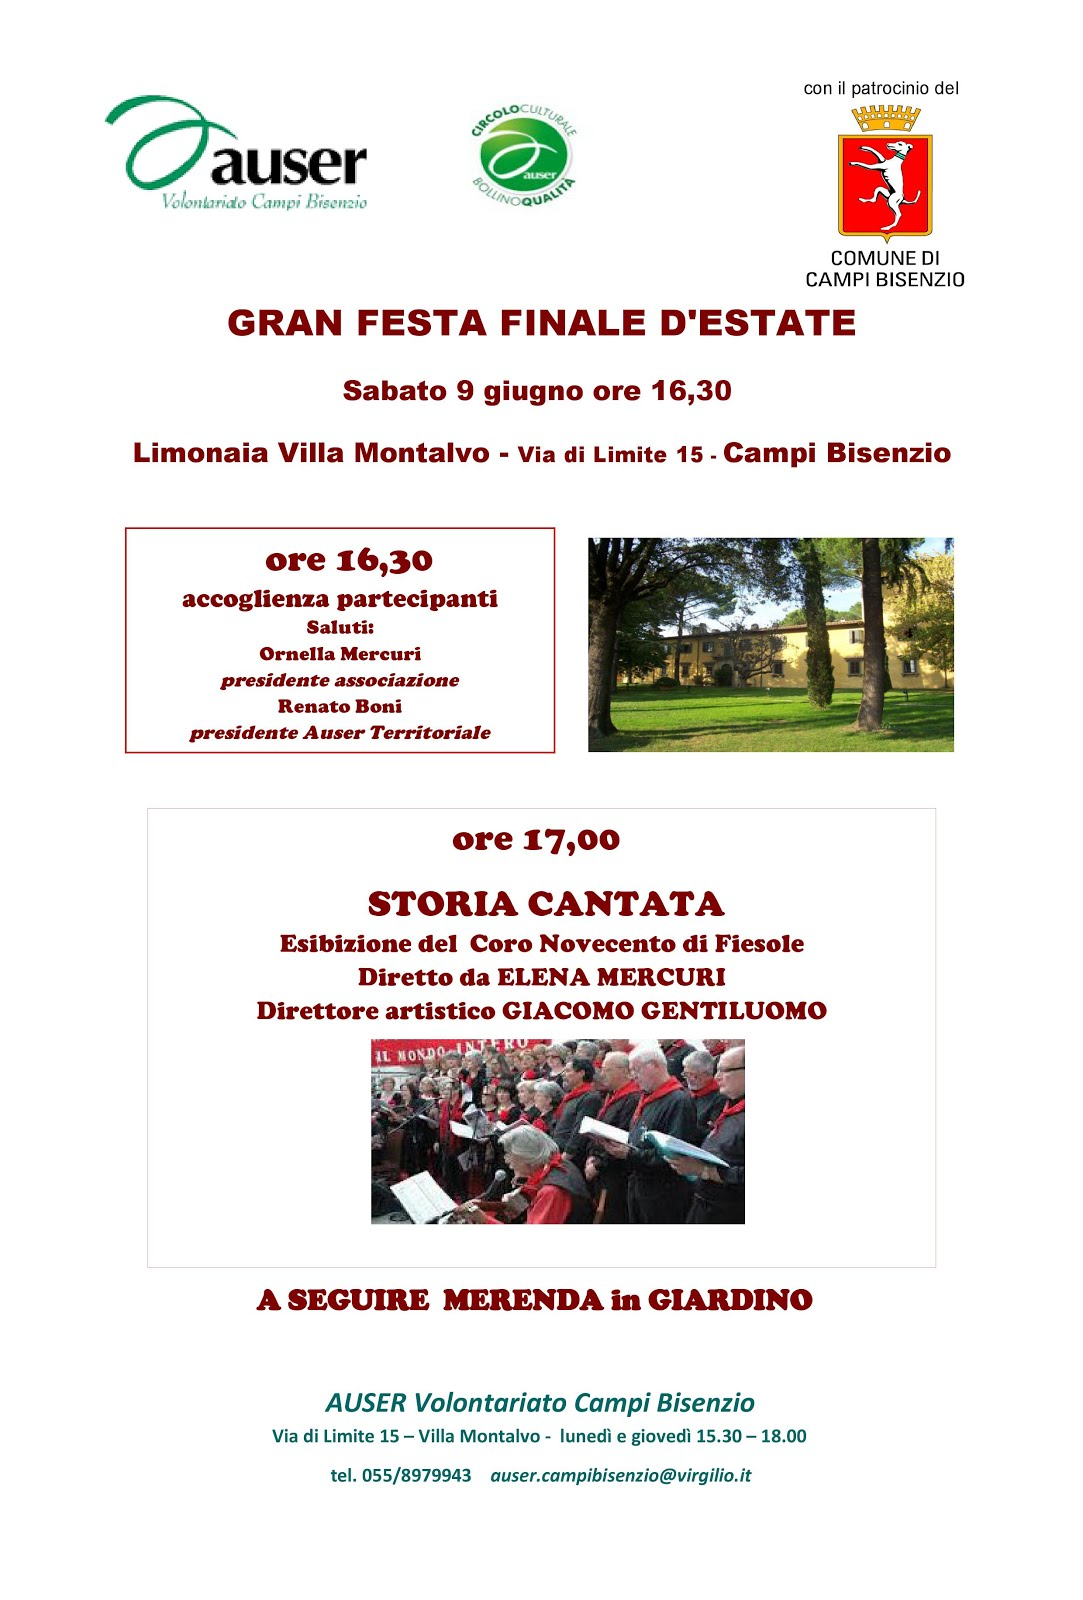 GRAN FESTA FINALE D'ESTATE